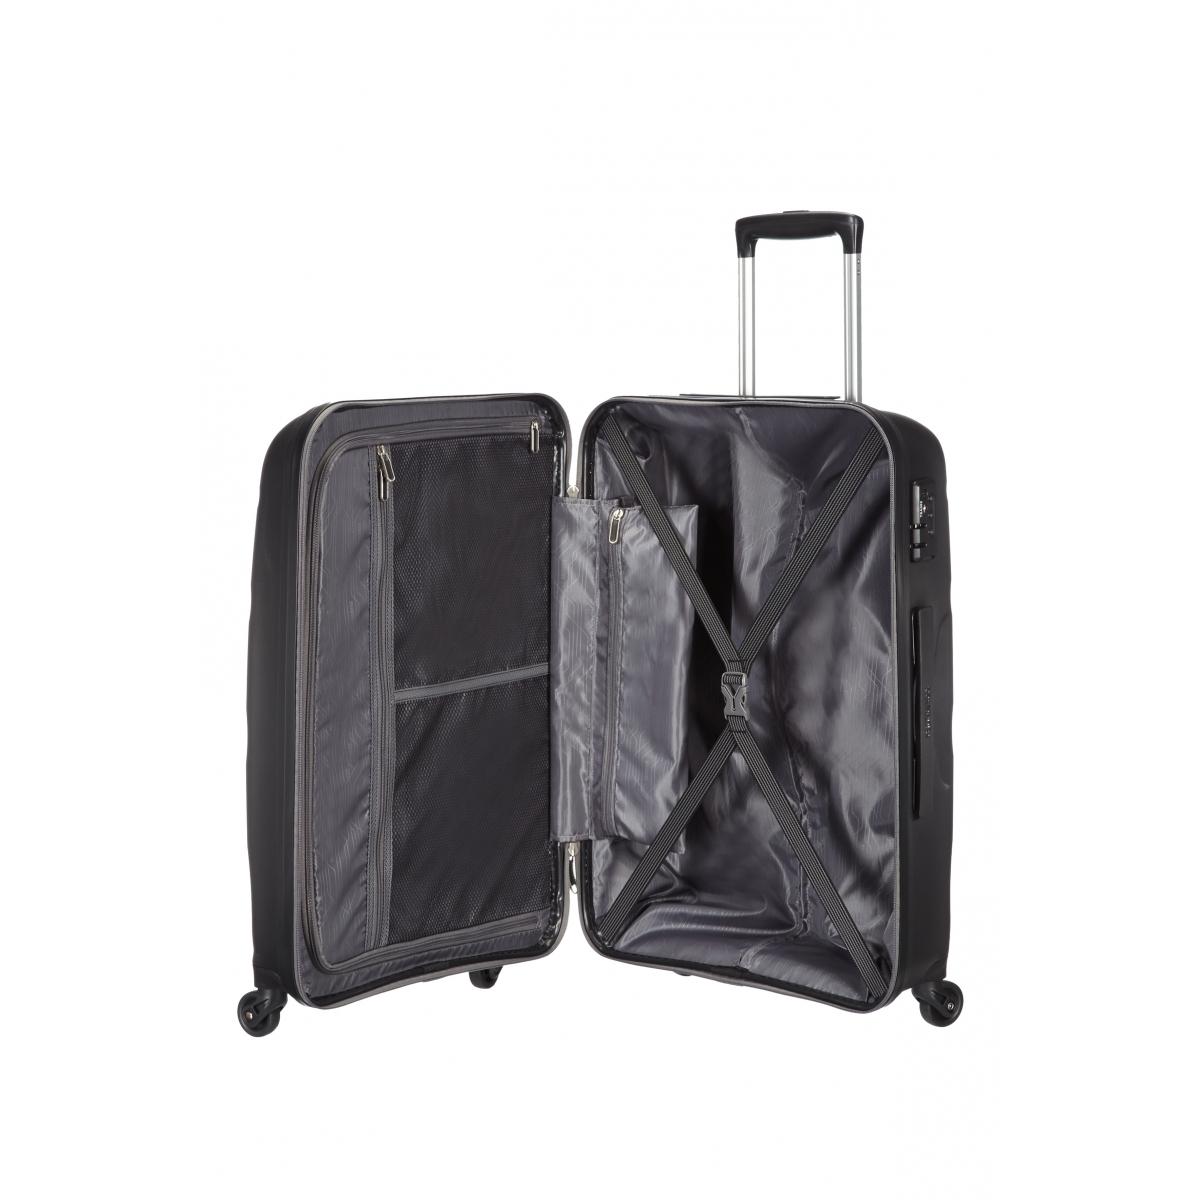 american tourister valise bon air spinner m noir 57. Black Bedroom Furniture Sets. Home Design Ideas